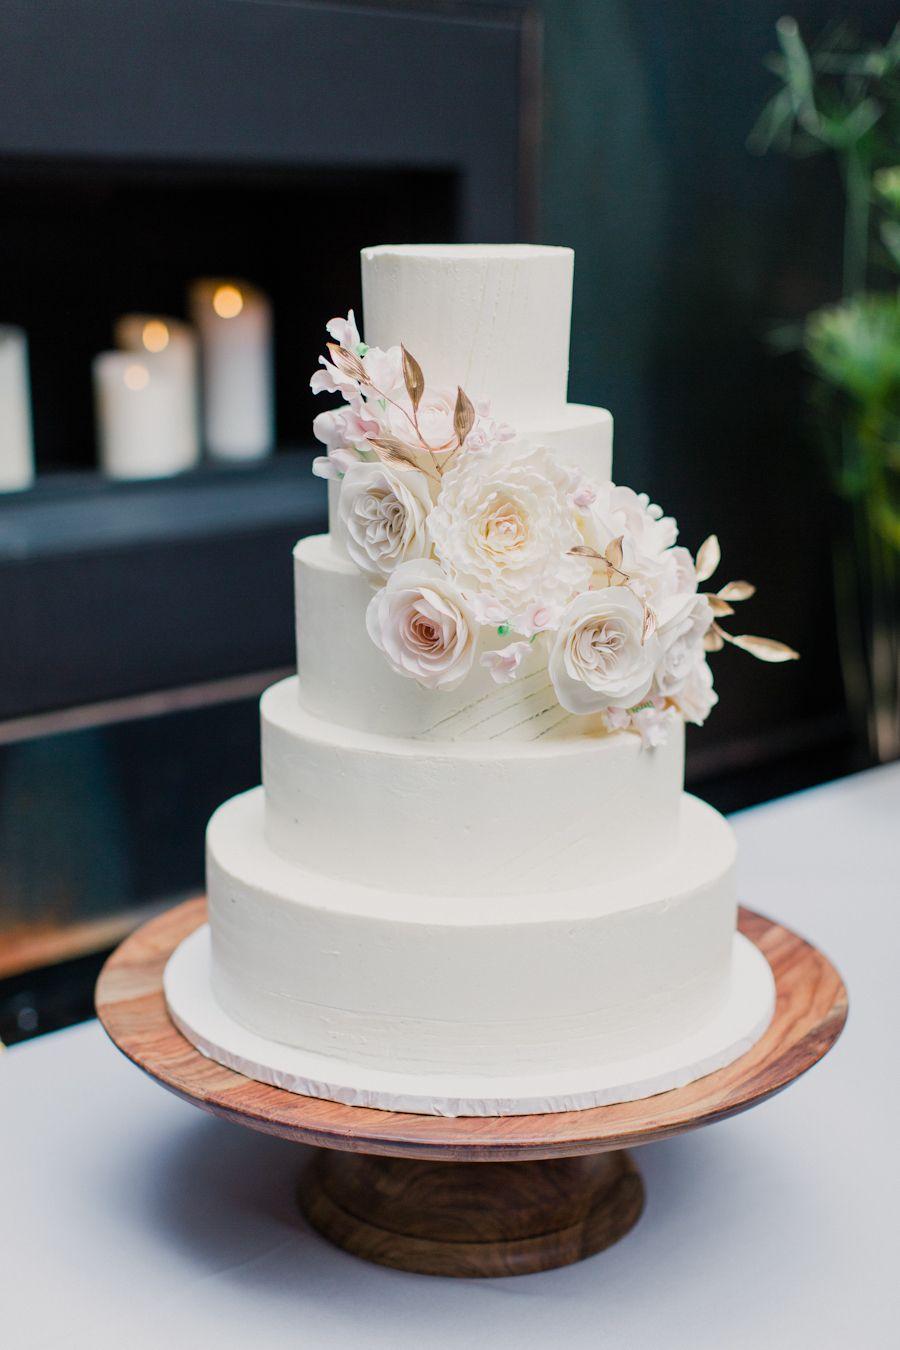 Contemporary Wedding Cakes New York City Elaboration - Wedding Idea ...